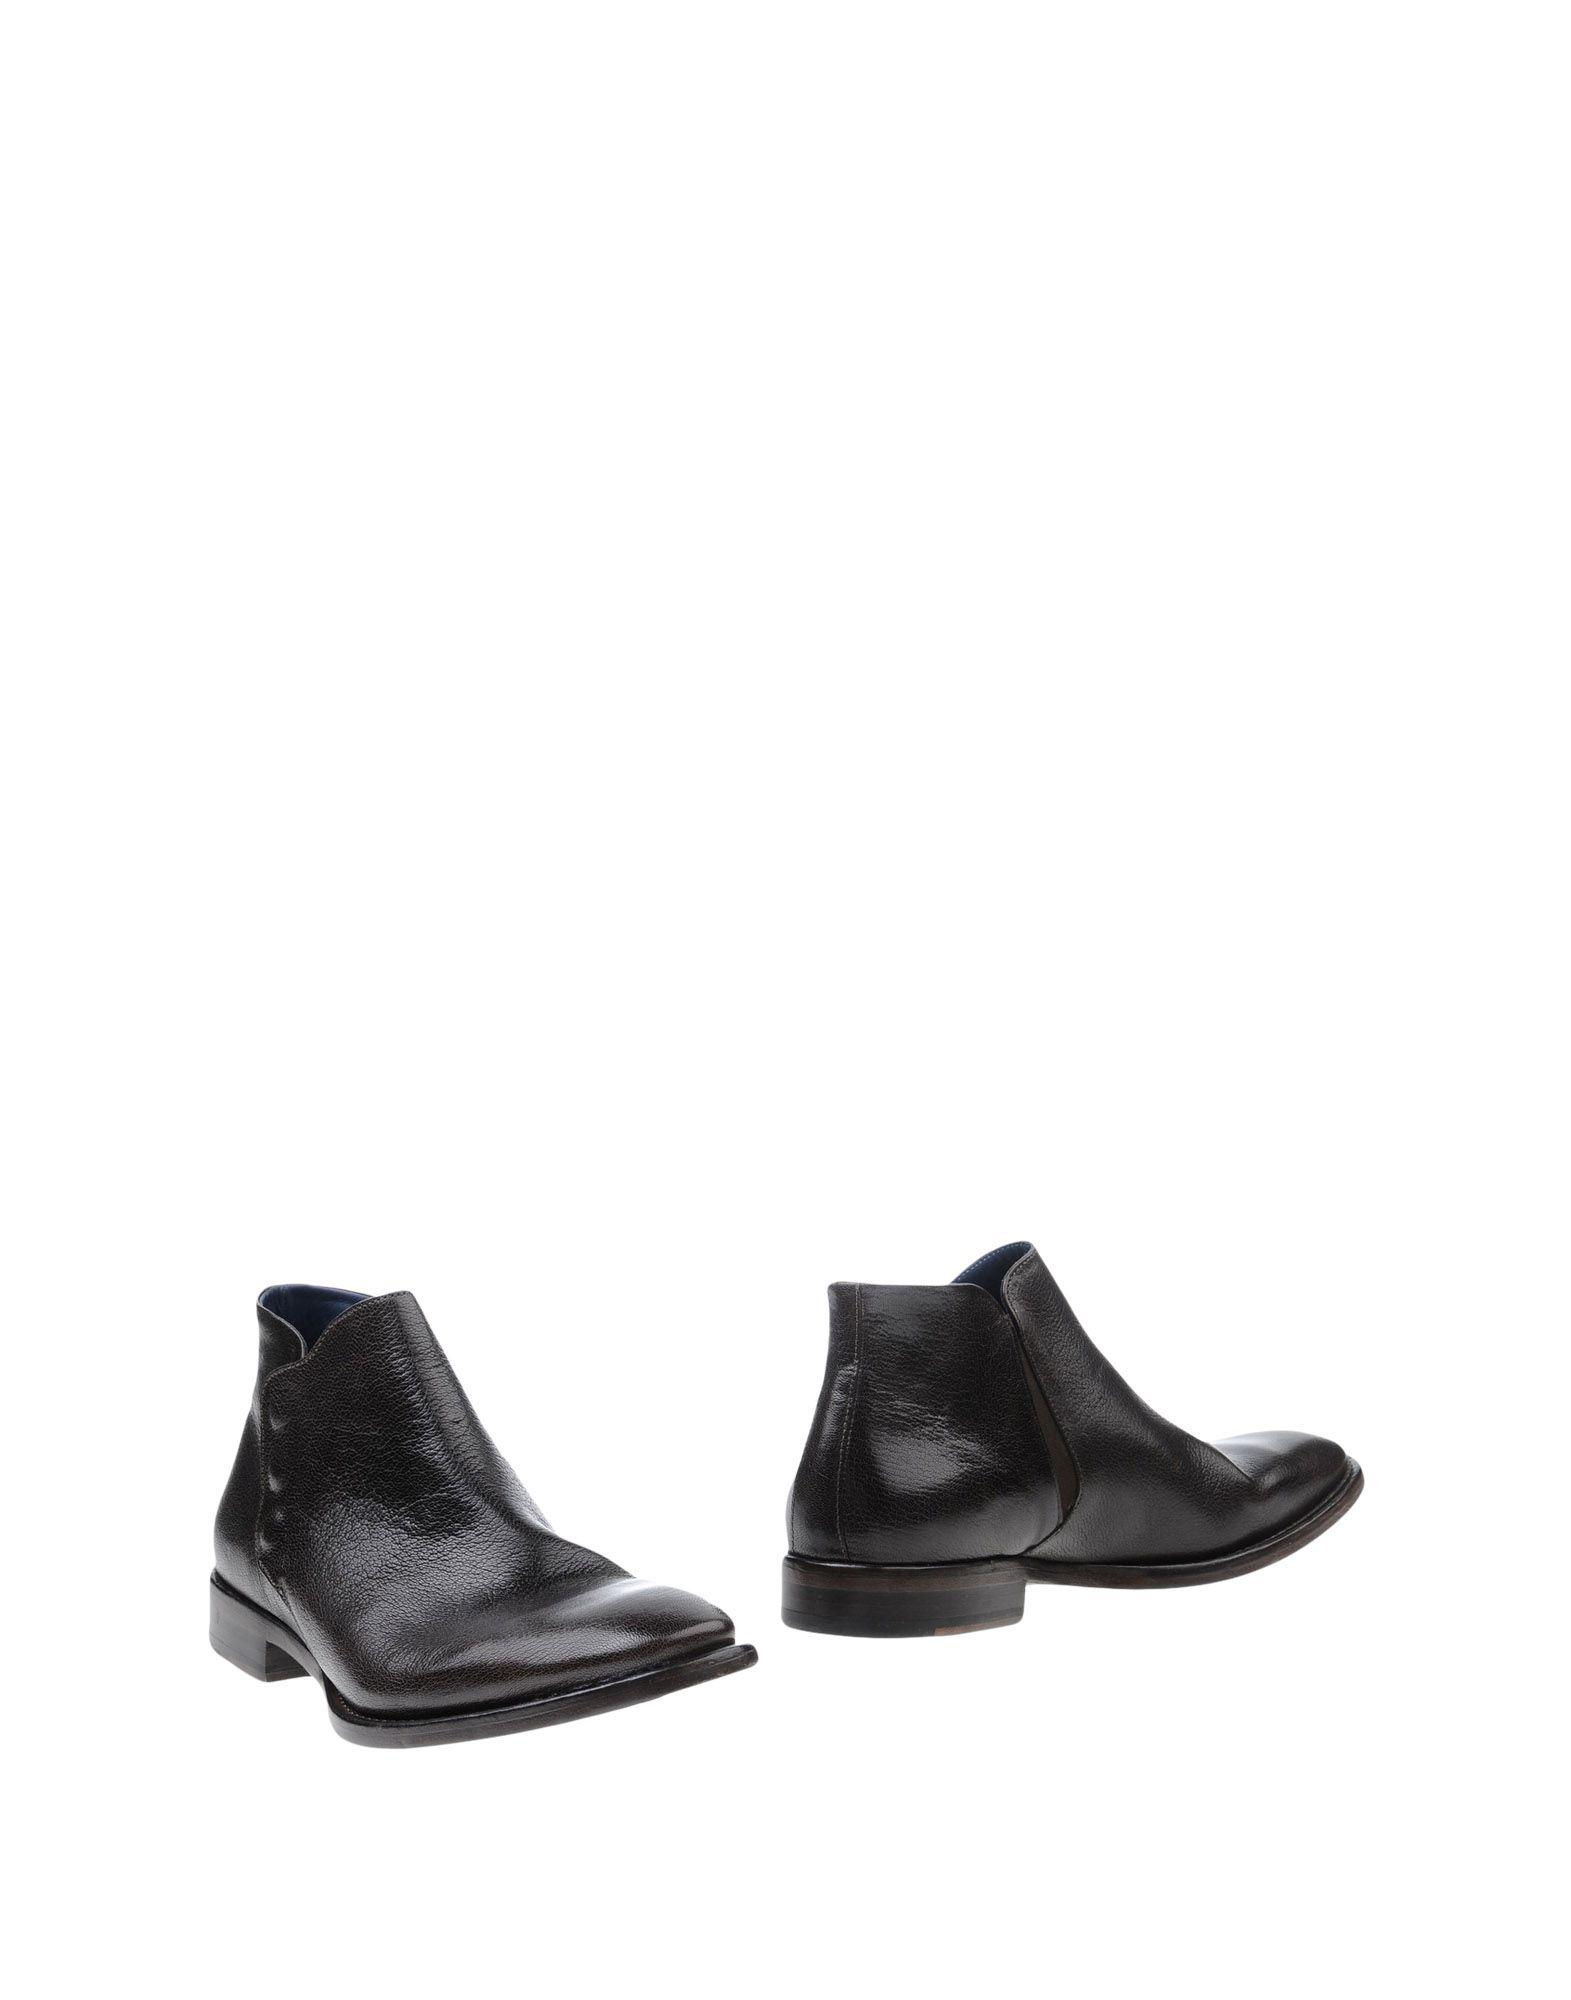 Rabatt echte Schuhe Creation Of Minds Stiefelette Herren  11373236VR